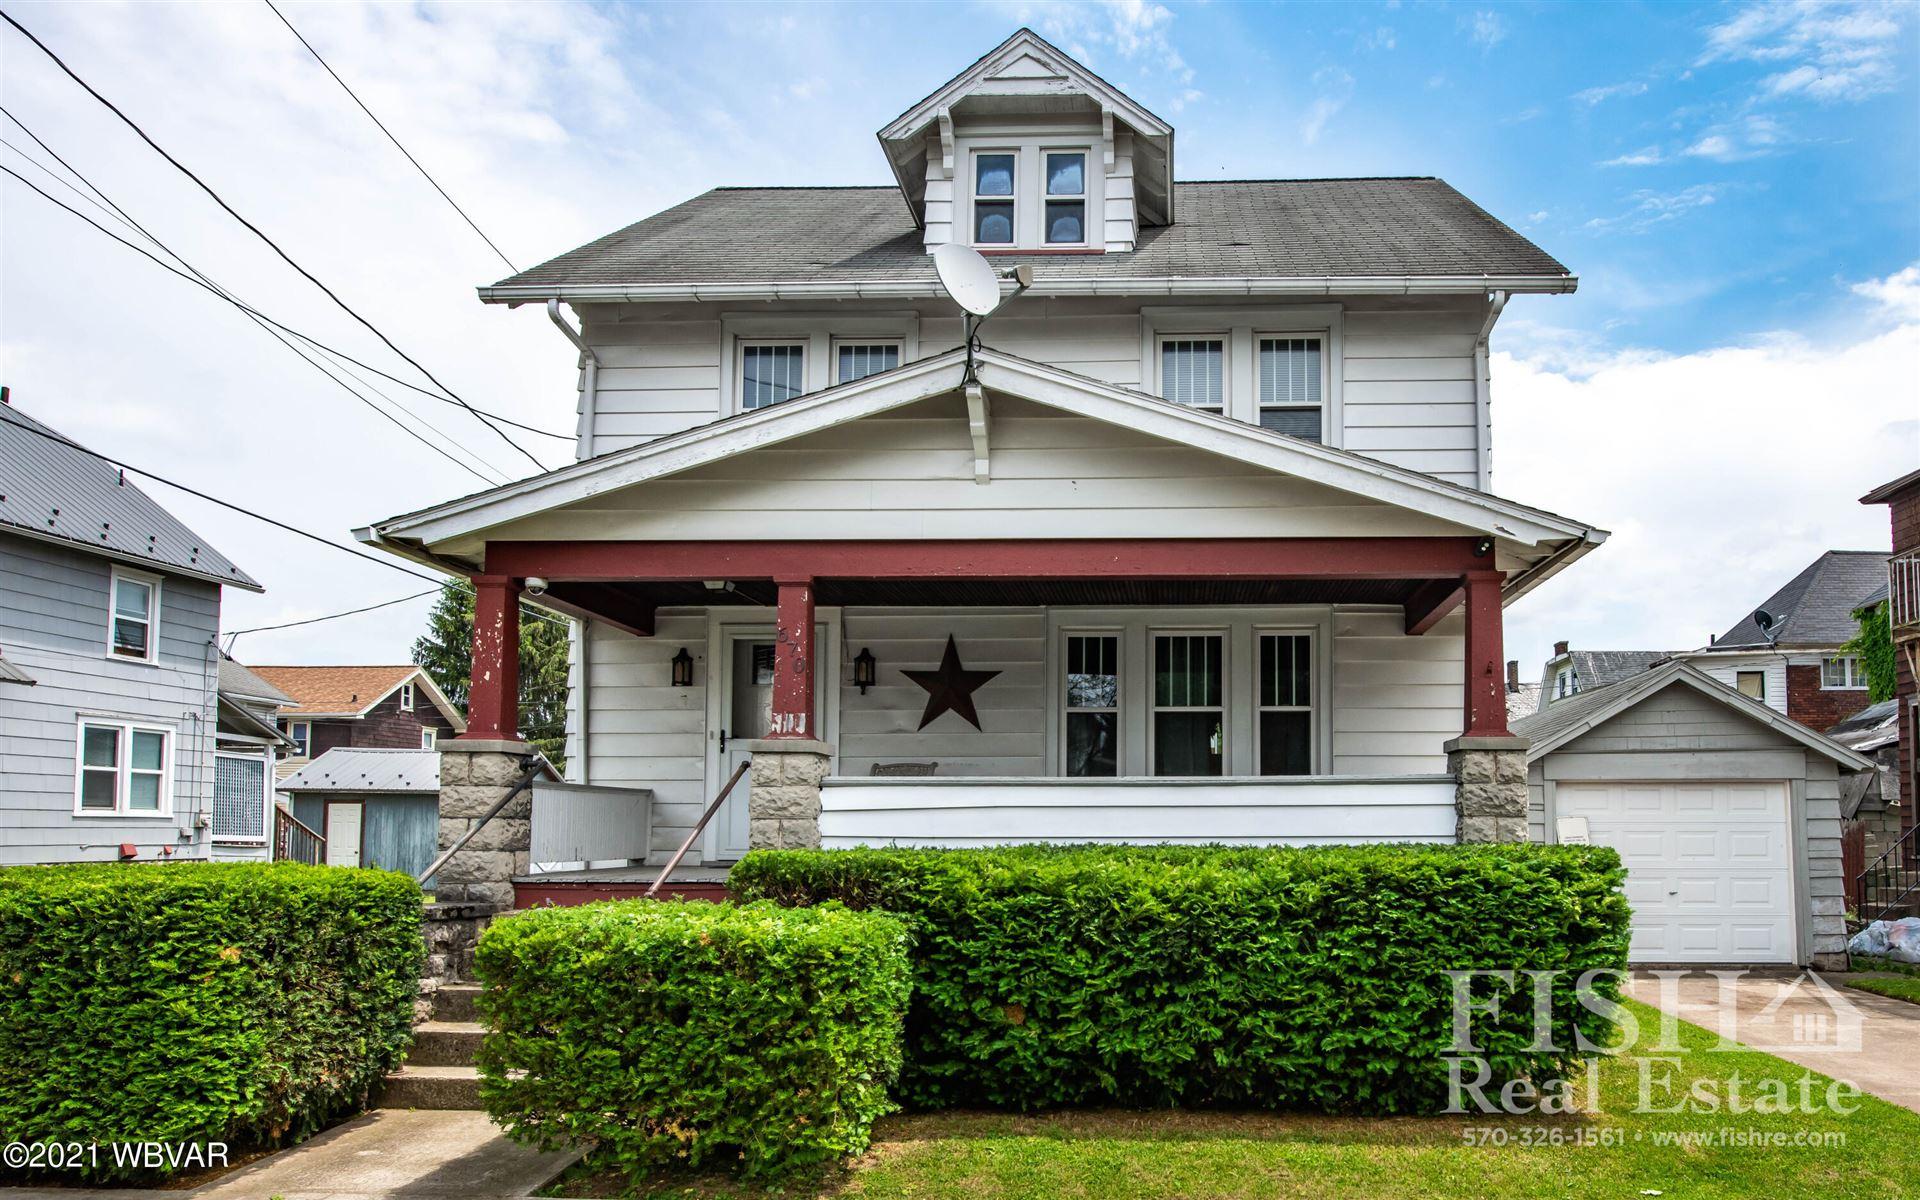 670 GRIER STREET, Williamsport, PA 17701 - #: WB-92849